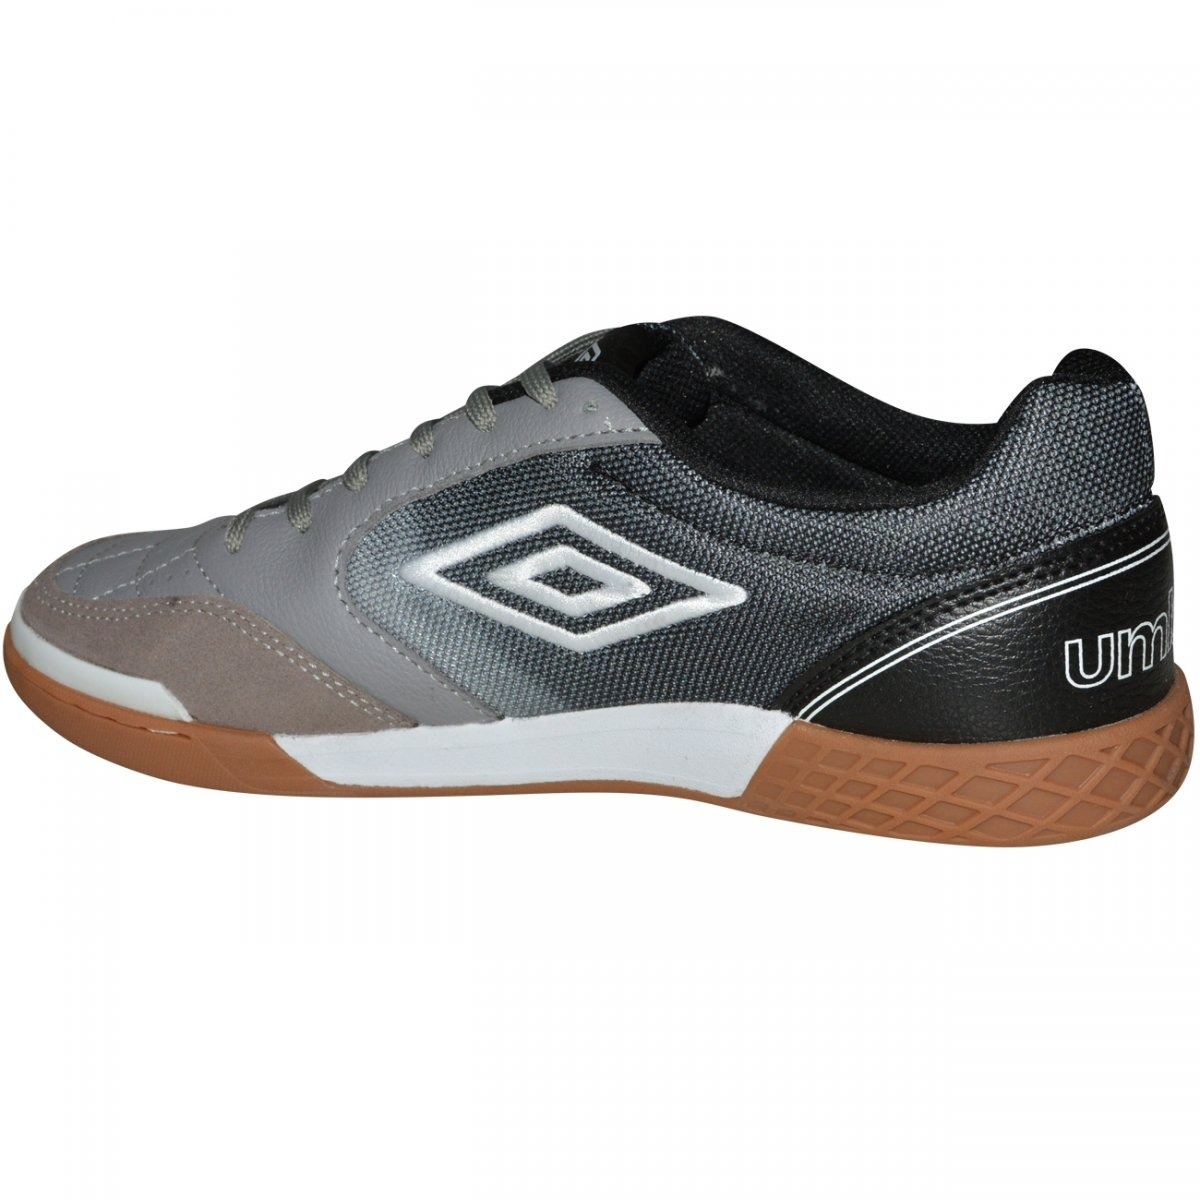 tênis de futsal umbro box id - cinza preto - original. Carregando zoom. c0983aed97e71